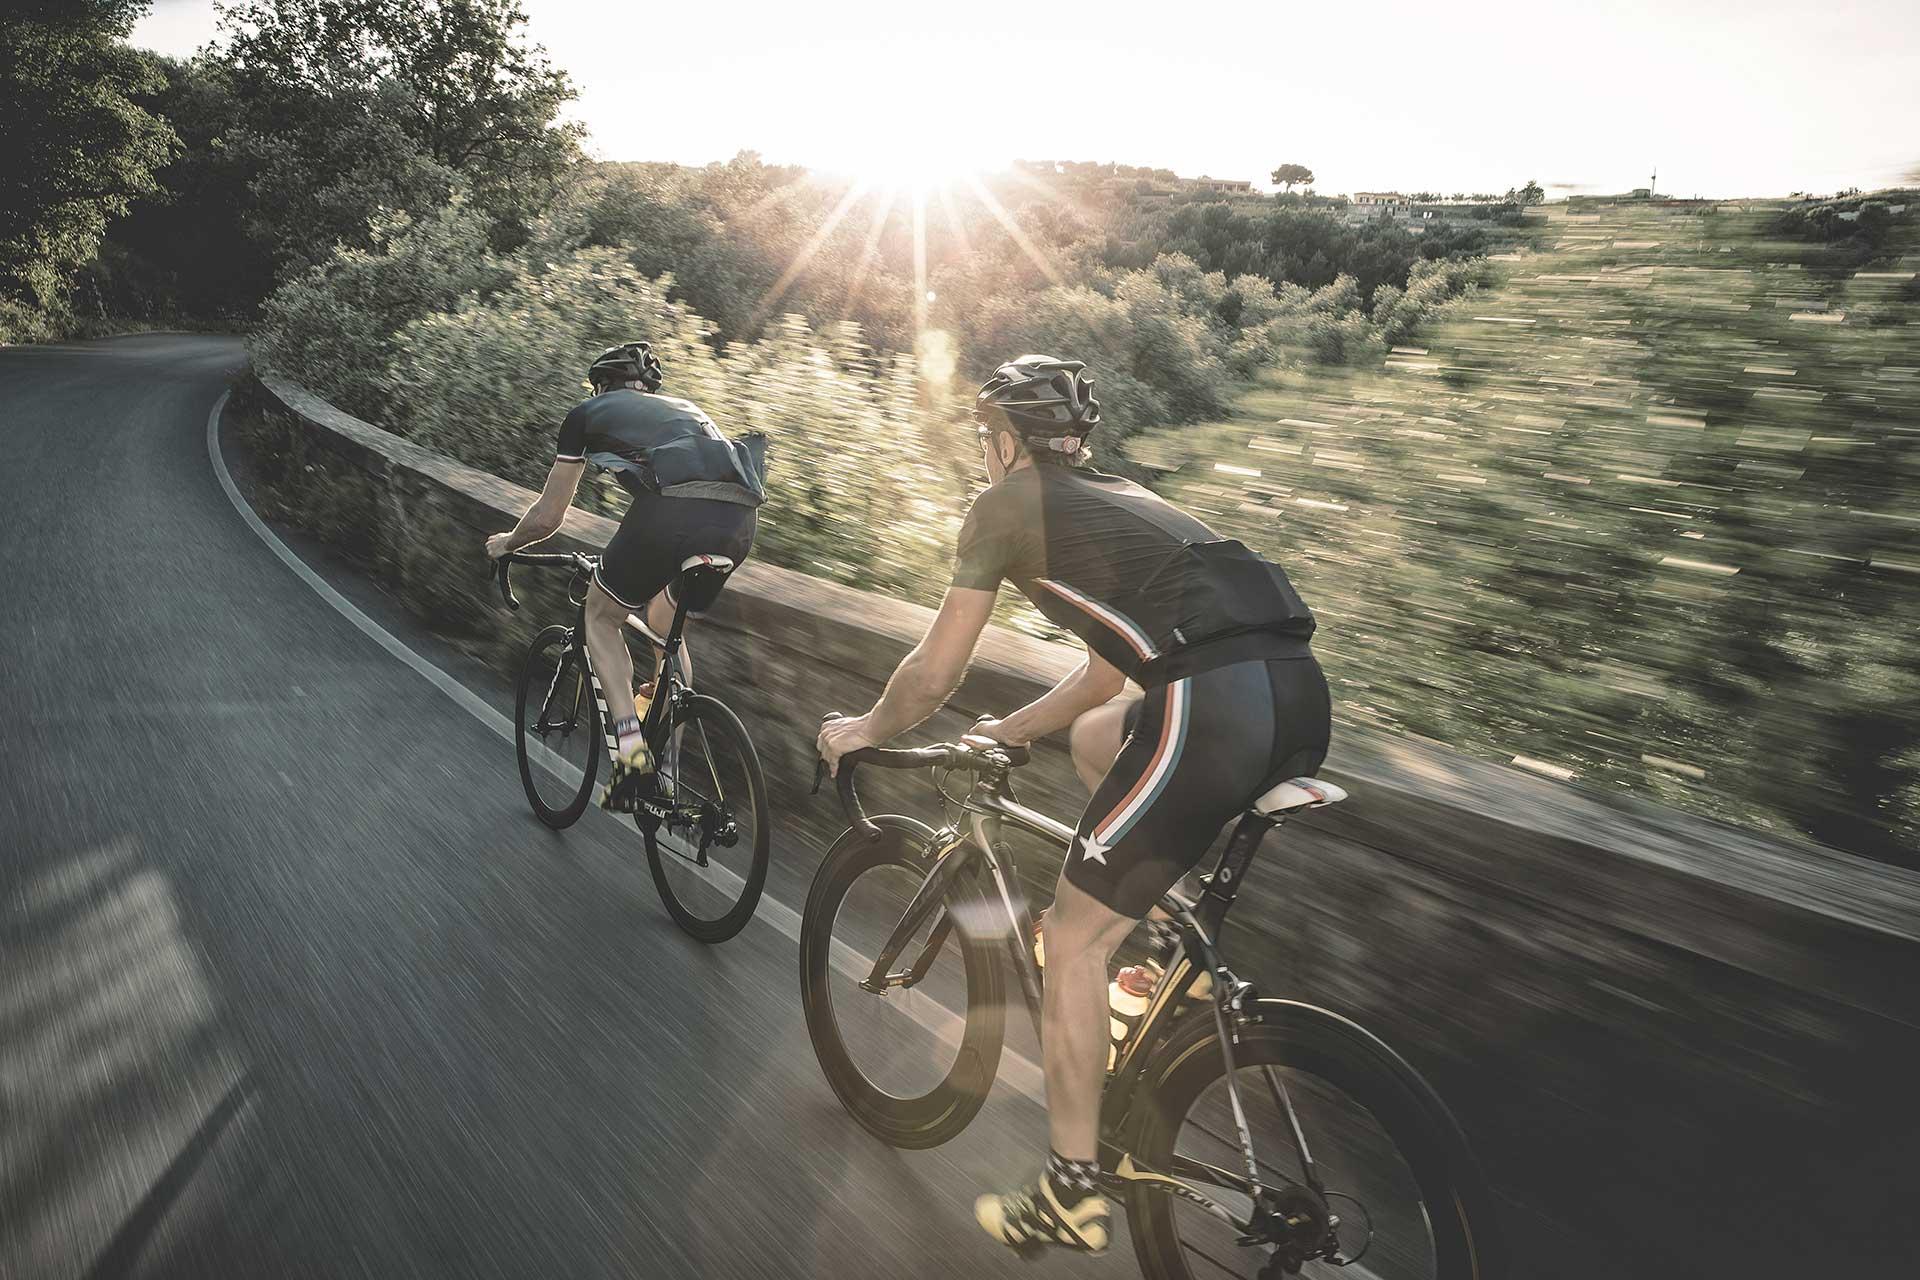 Rennrad Fotograf Outdoor Sport Aktion Fahrrad Mailand San Remo Maloja